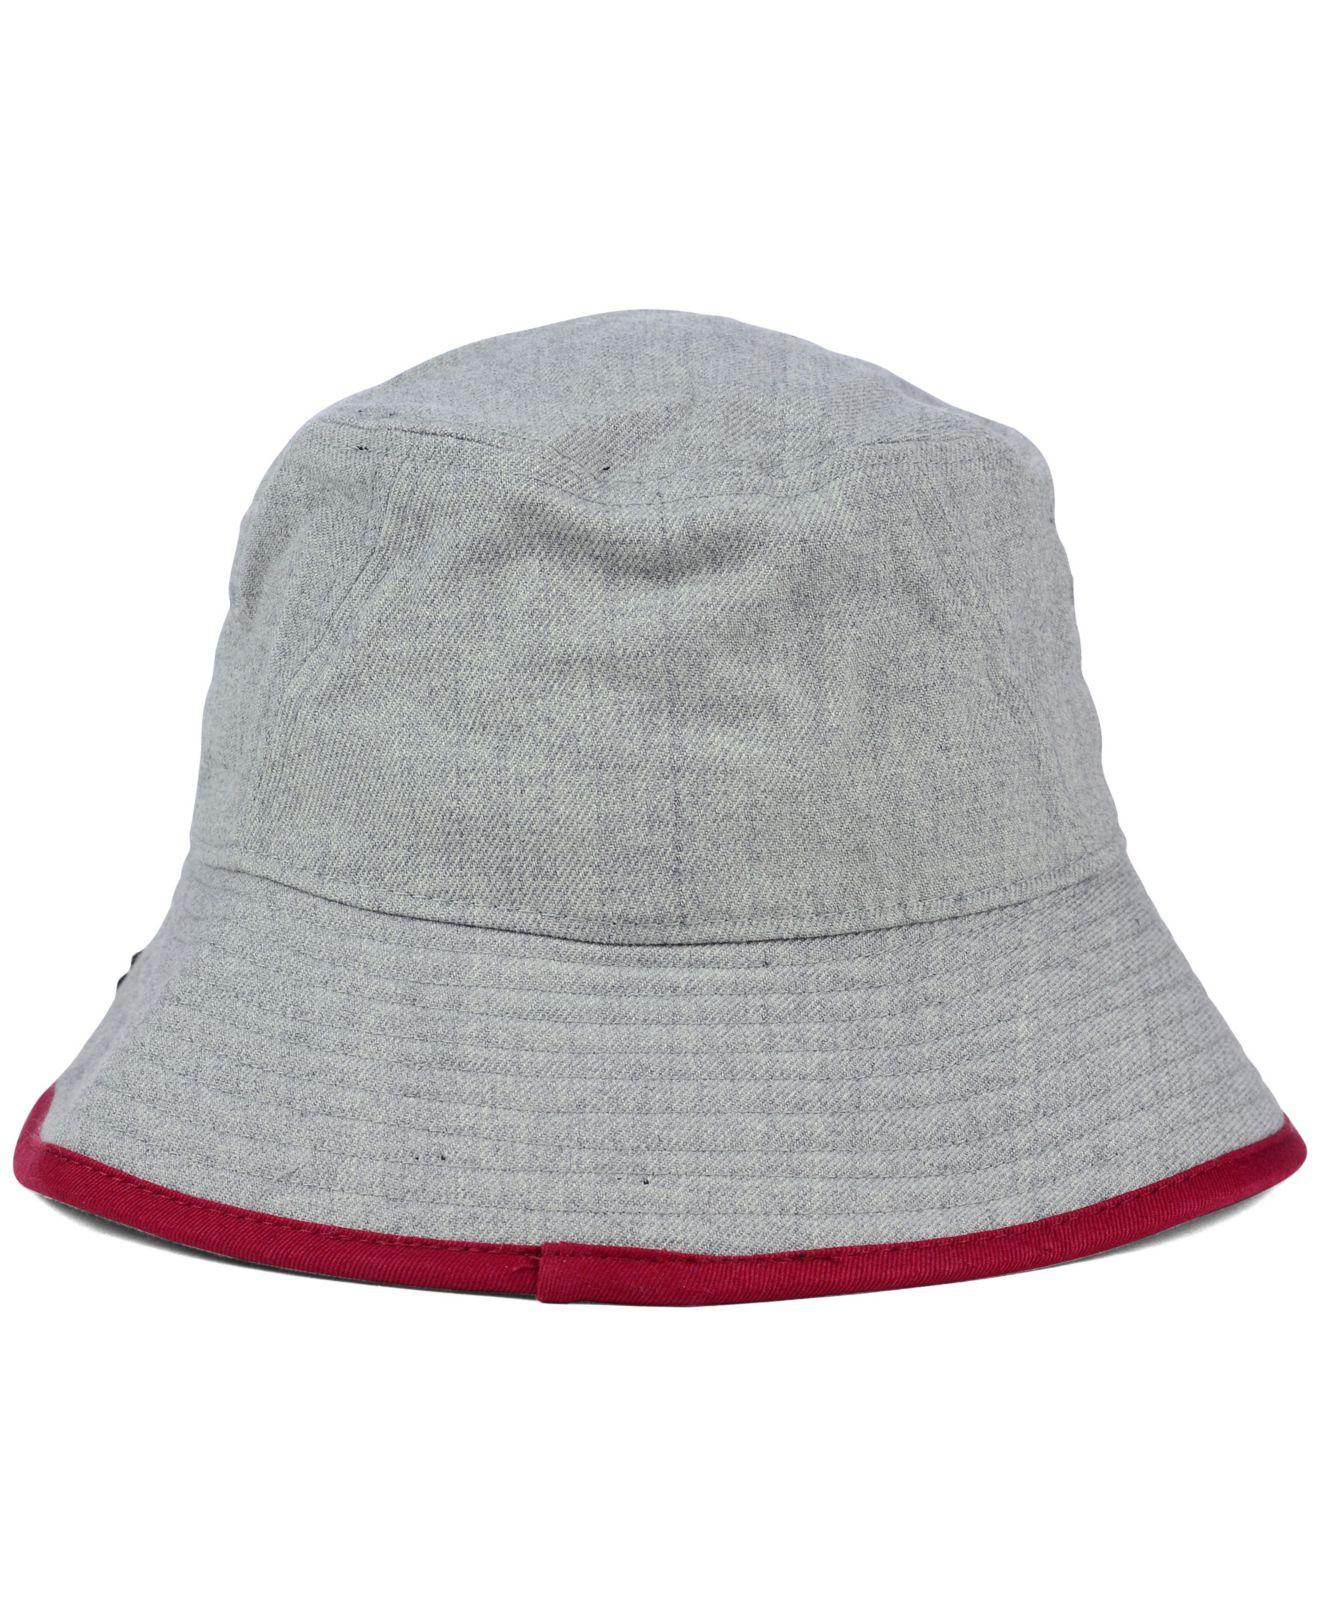 b1090a2136ba8 KTZ South Carolina Gamecocks Tip Bucket Hat in Gray - Lyst